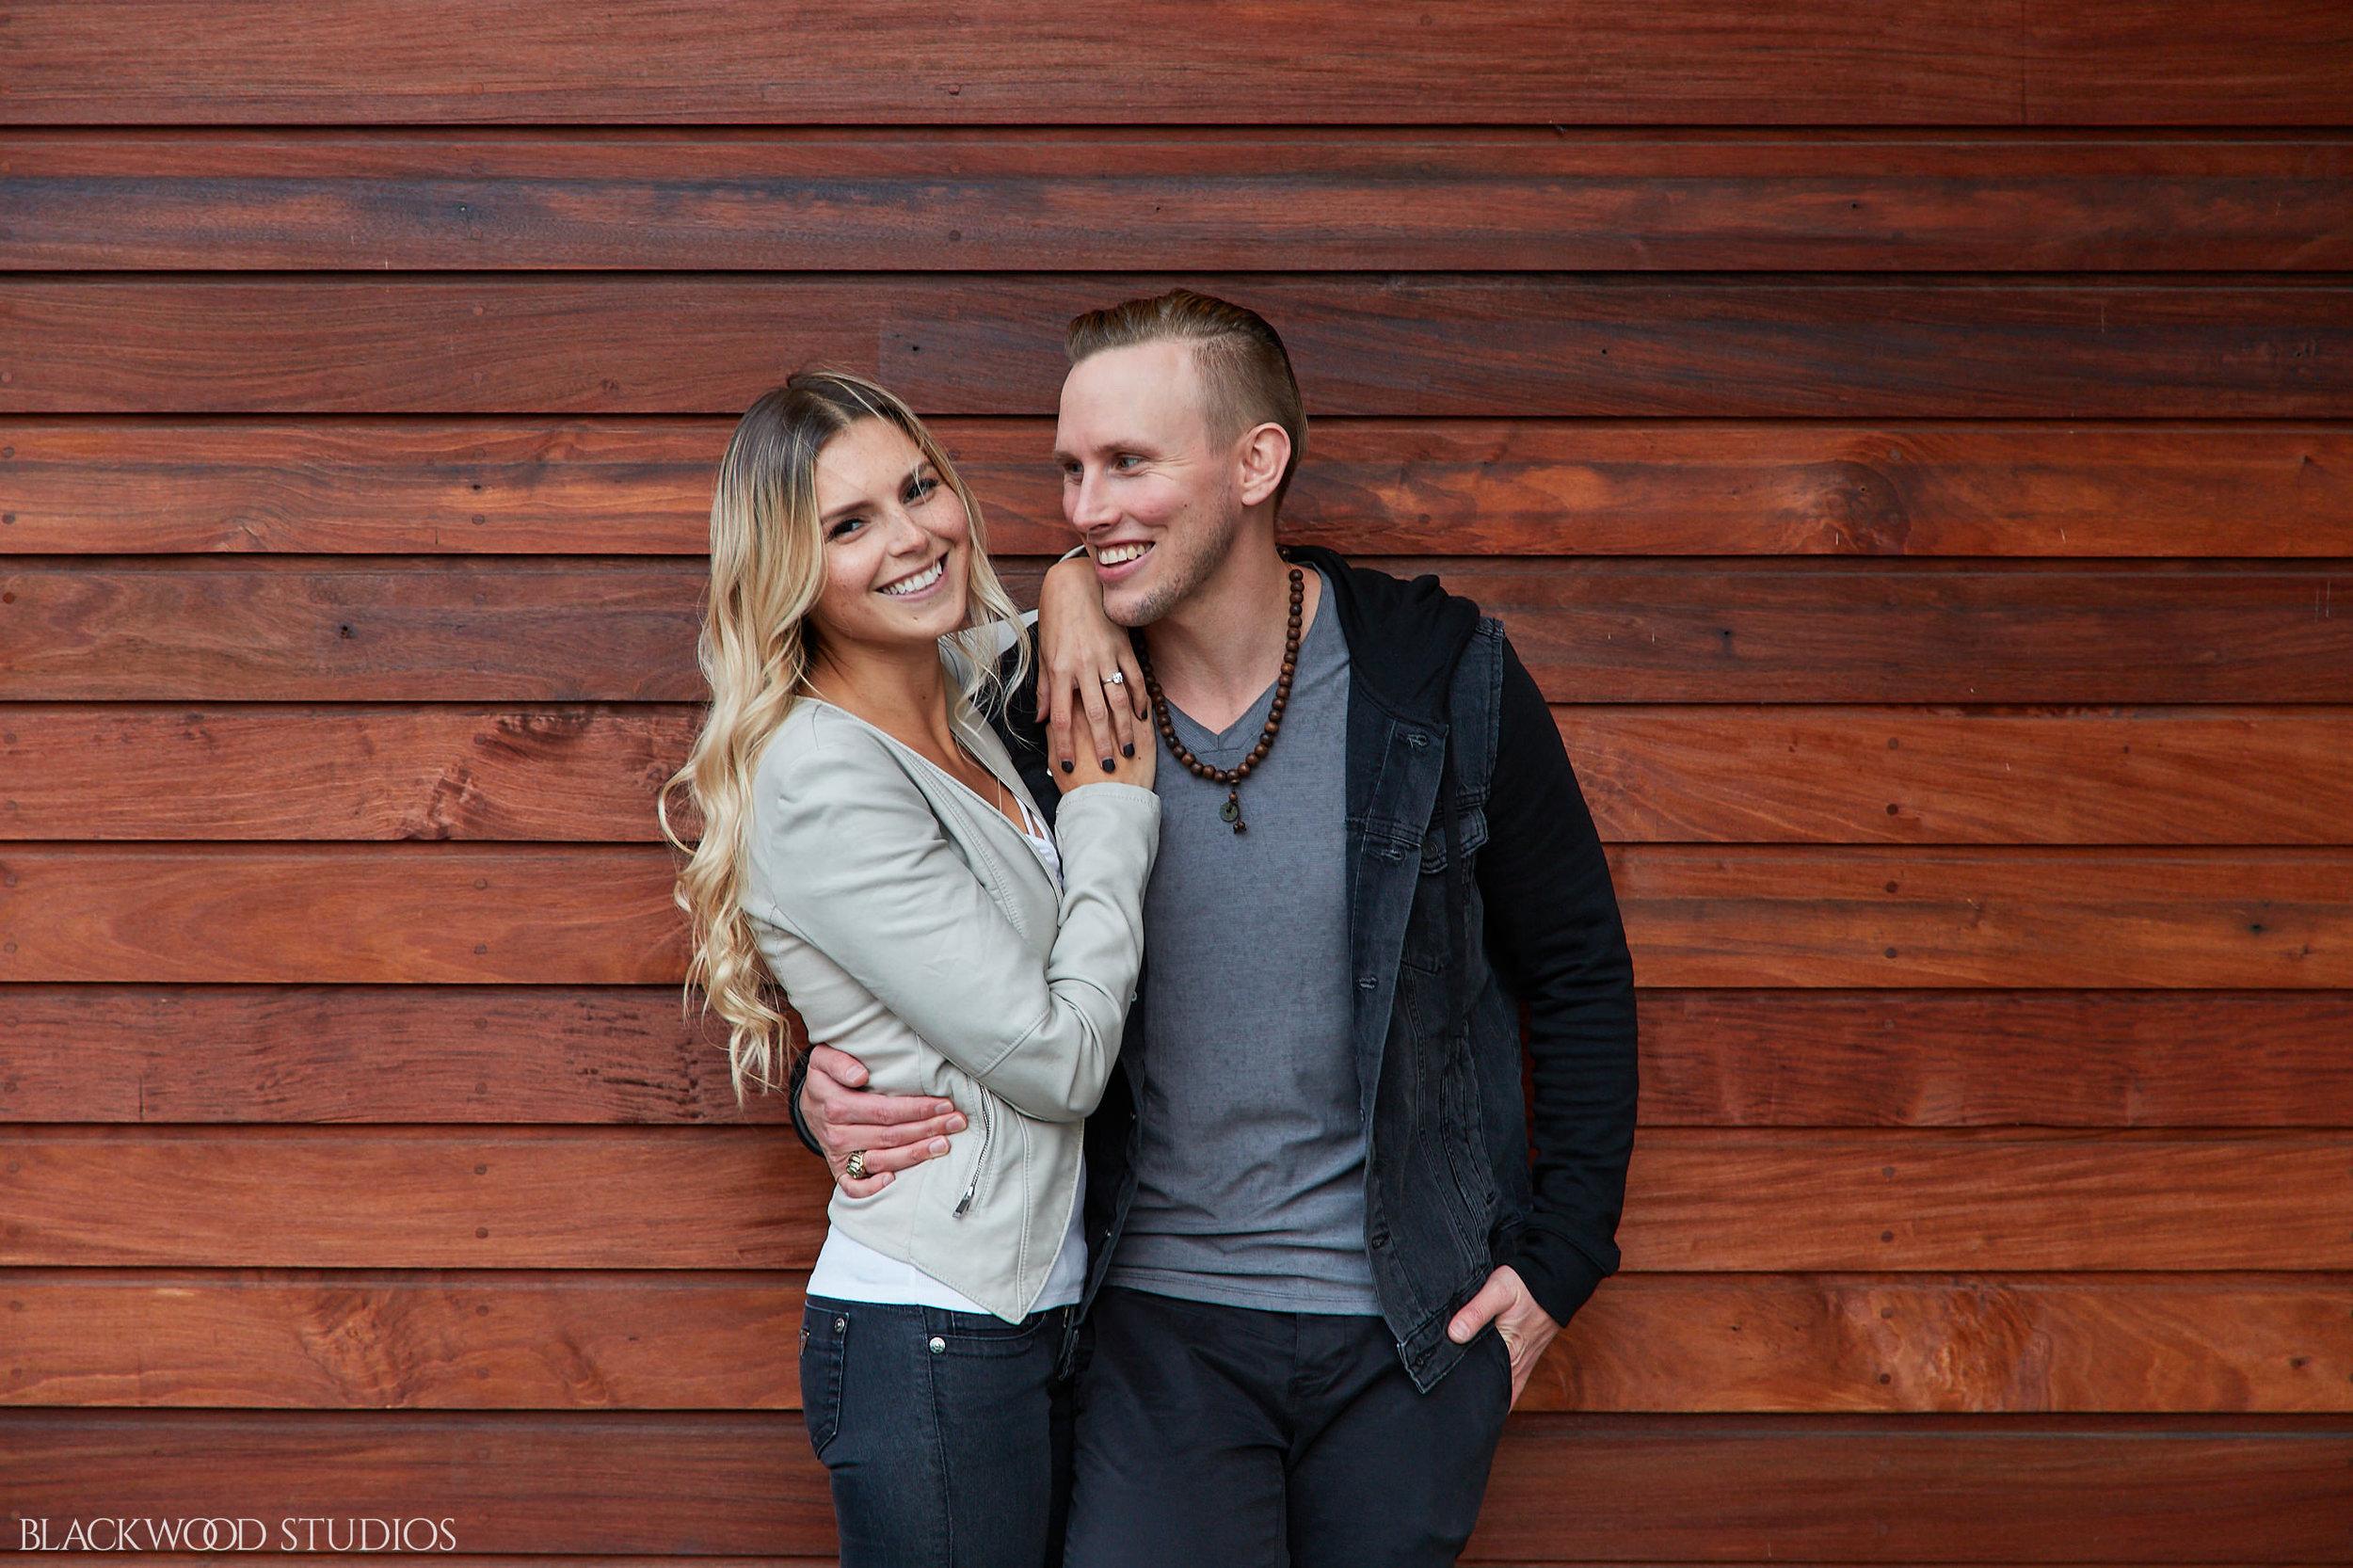 Blackwood-Studios-20181012-180923-Aleisha-and-Brad-Engagement-photography-Toronto-Ontario-Canada-Corktown-Common.jpg